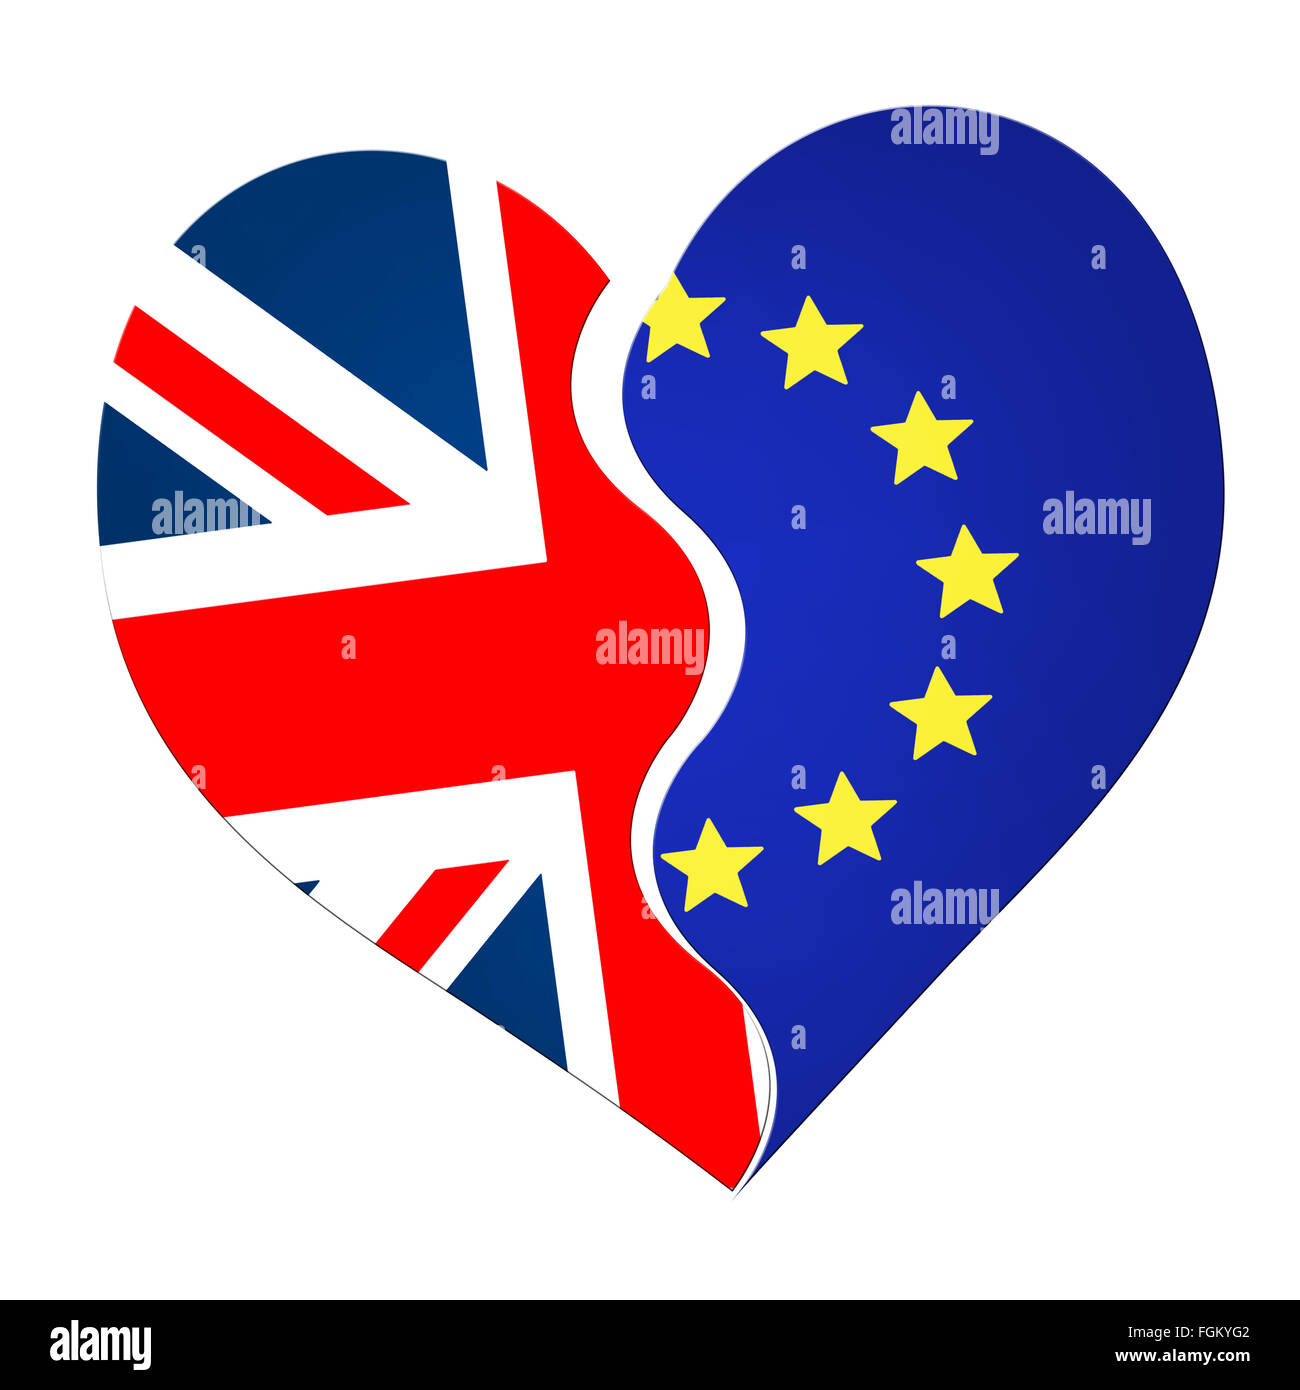 Potentially divisive split. UK EU referendum. - Stock Image